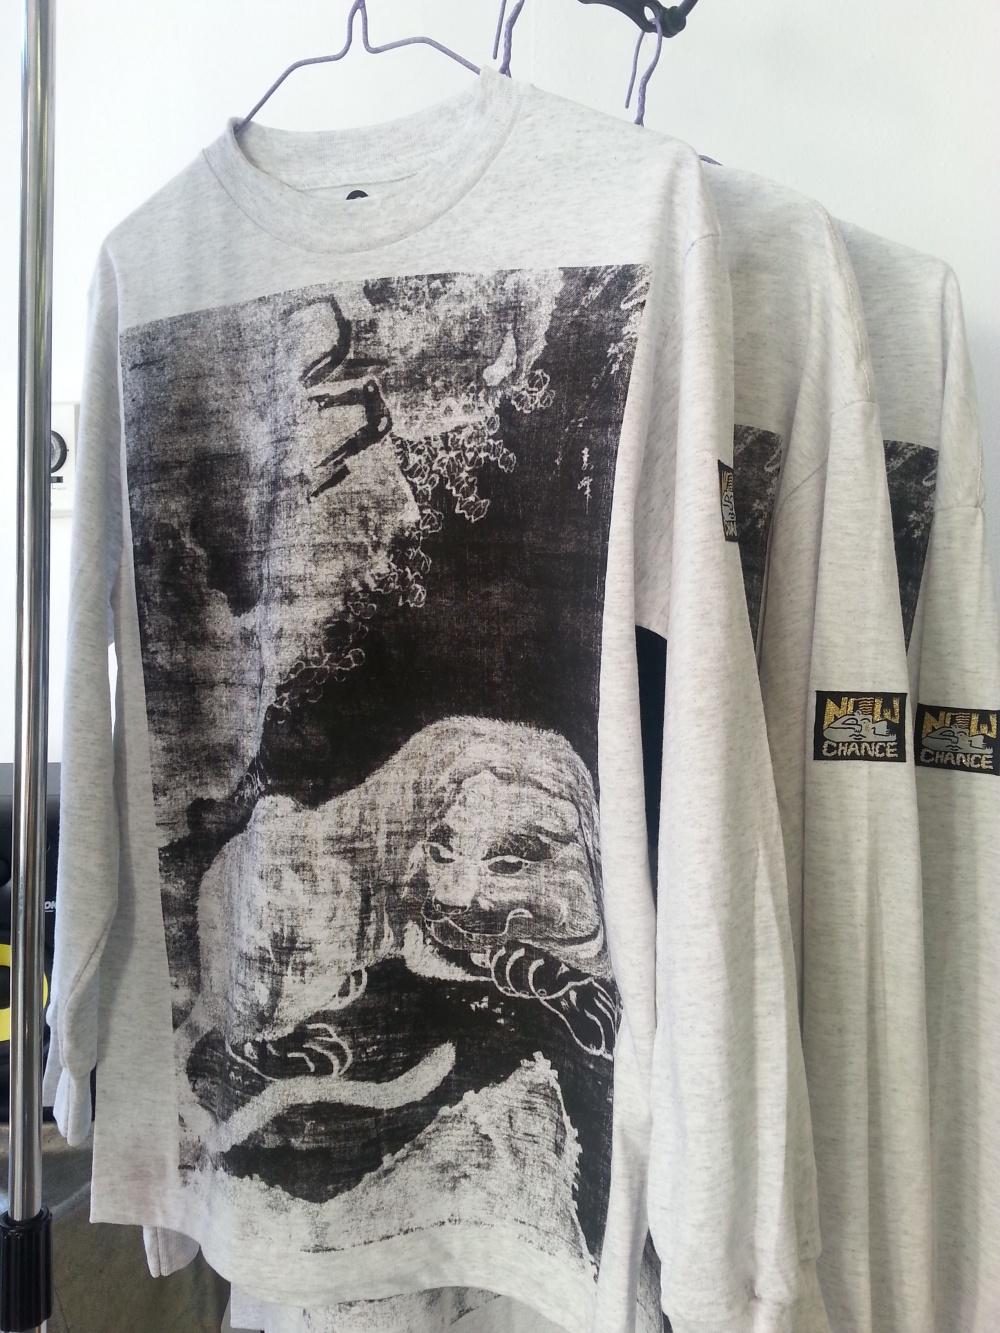 New Chance Long Sleeve Tiger Print Shirt